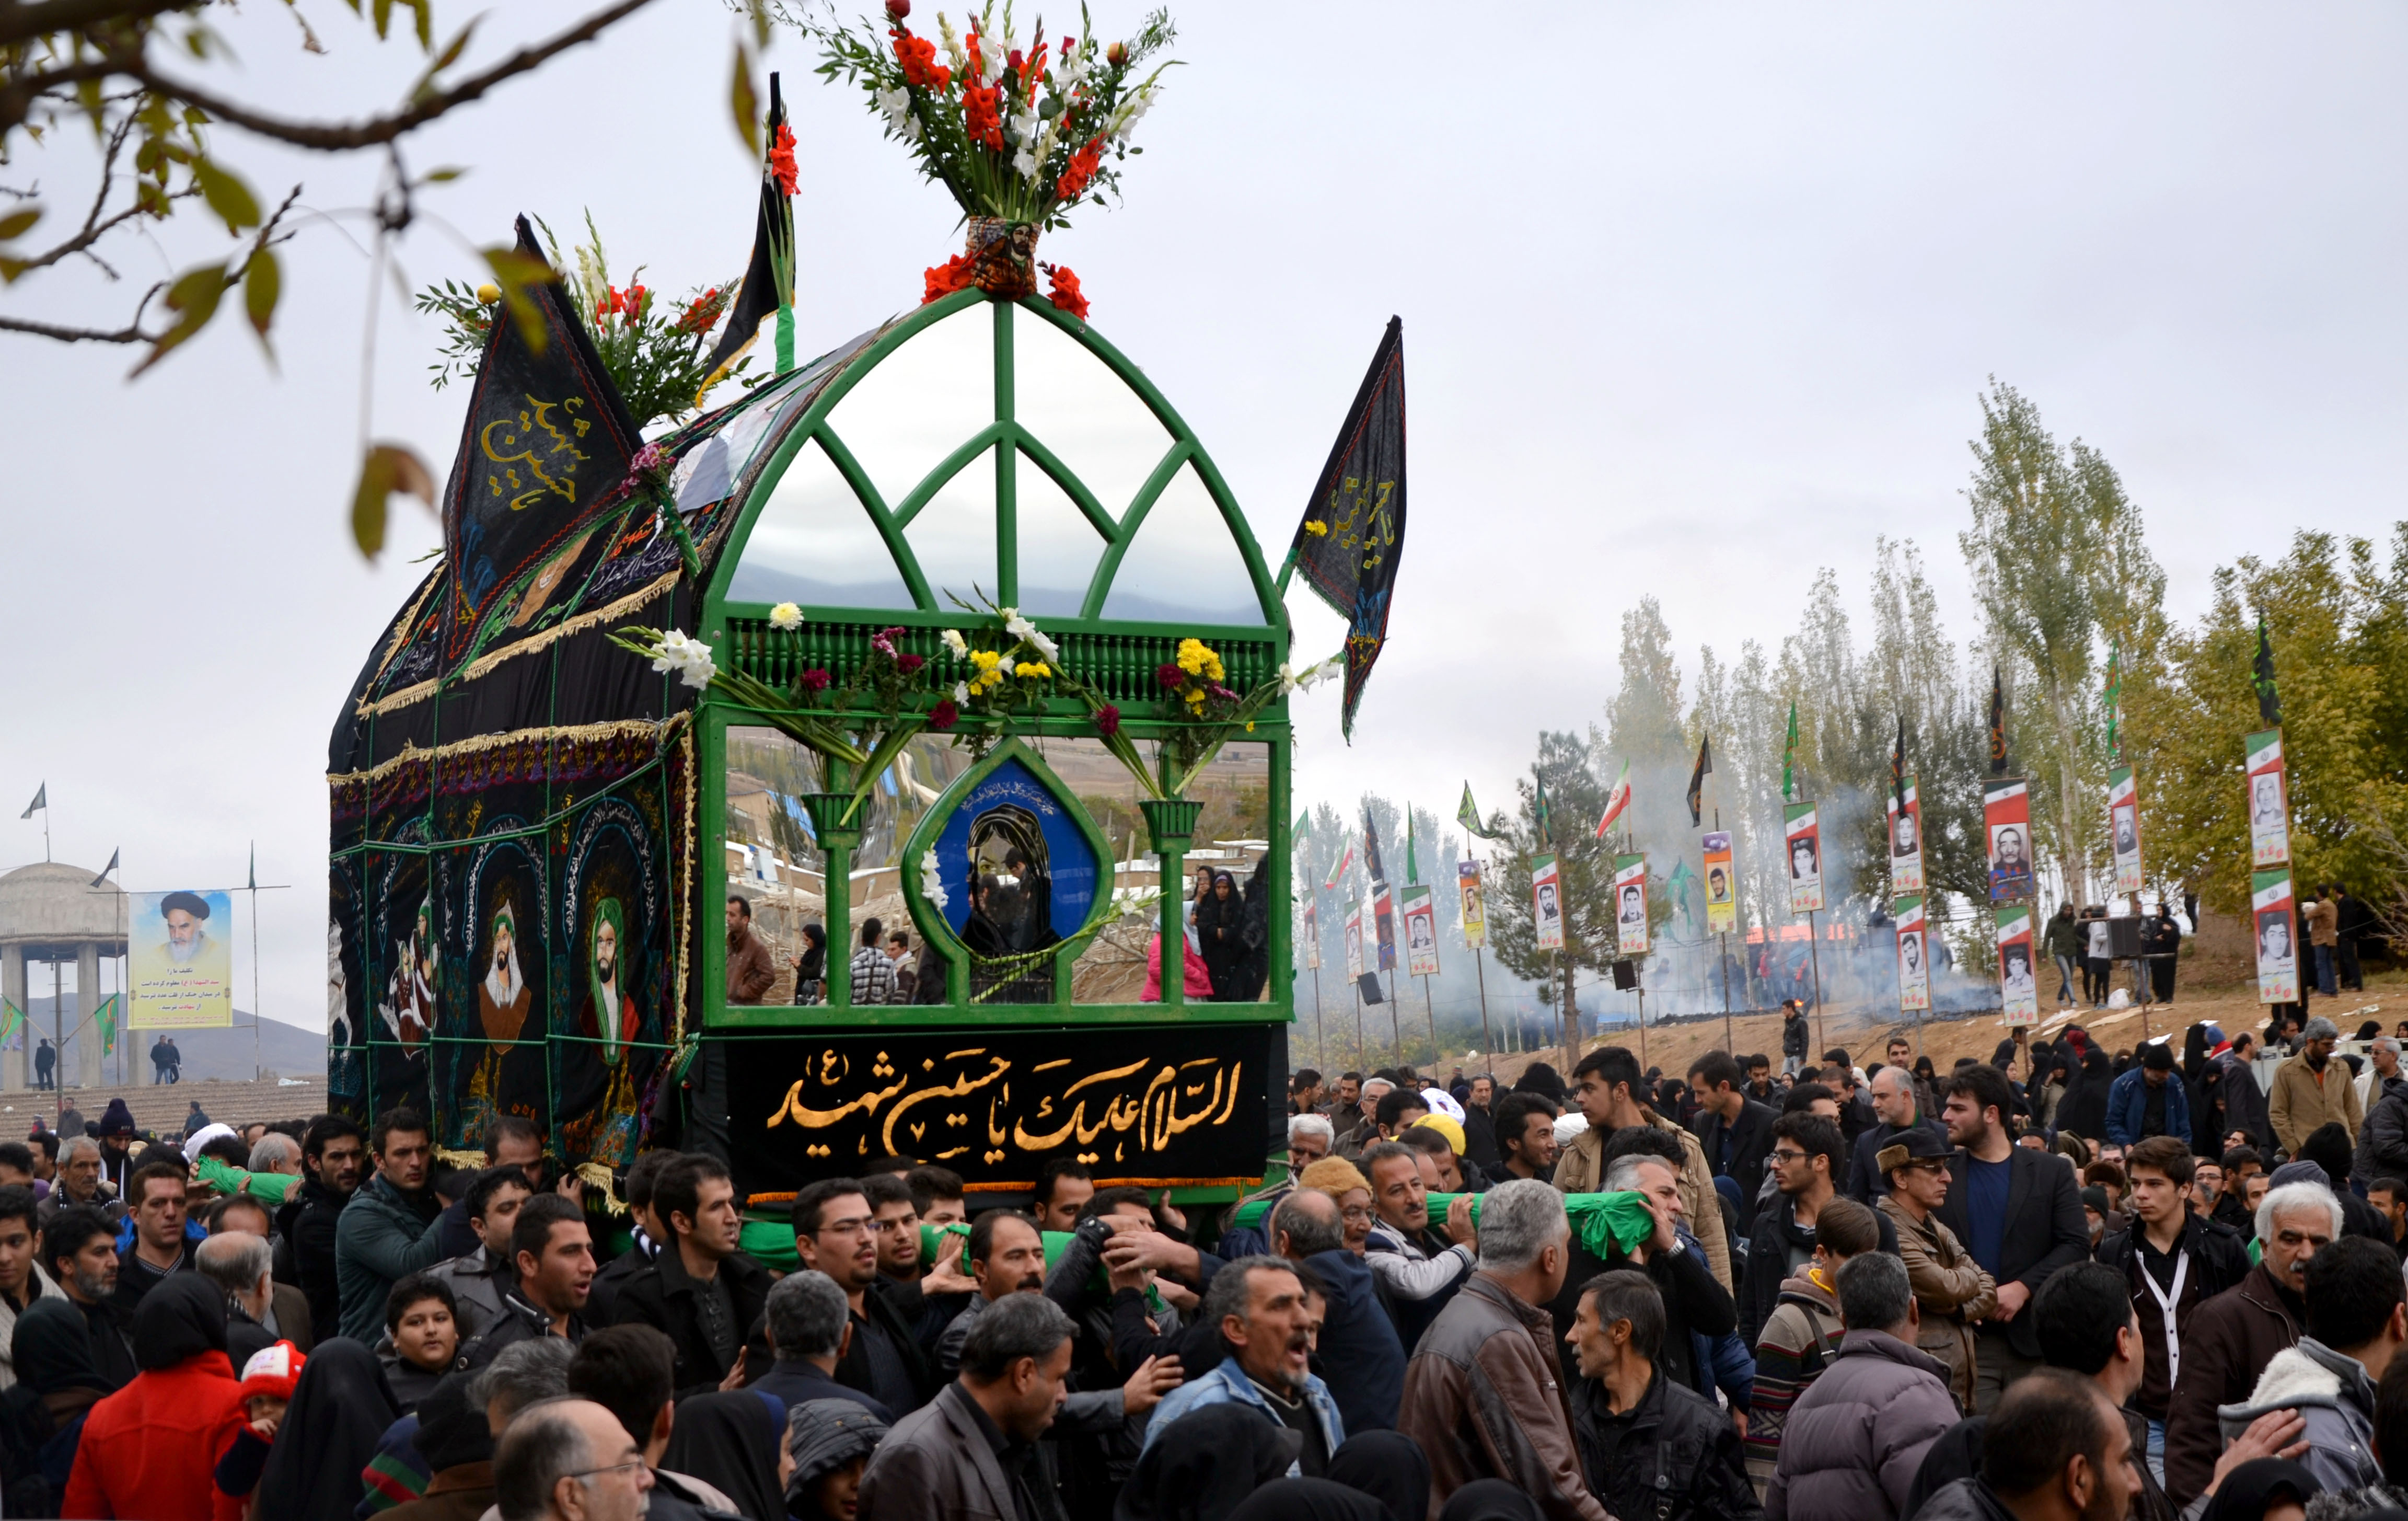 PunjabKesari, Muharram, Muharram 2019, मुहर्रम, मुहर्रम पैगंबर मुहम्मद साहब, इमाम हुसैन, Muharram Prophet Muhammad, Imam Hussain